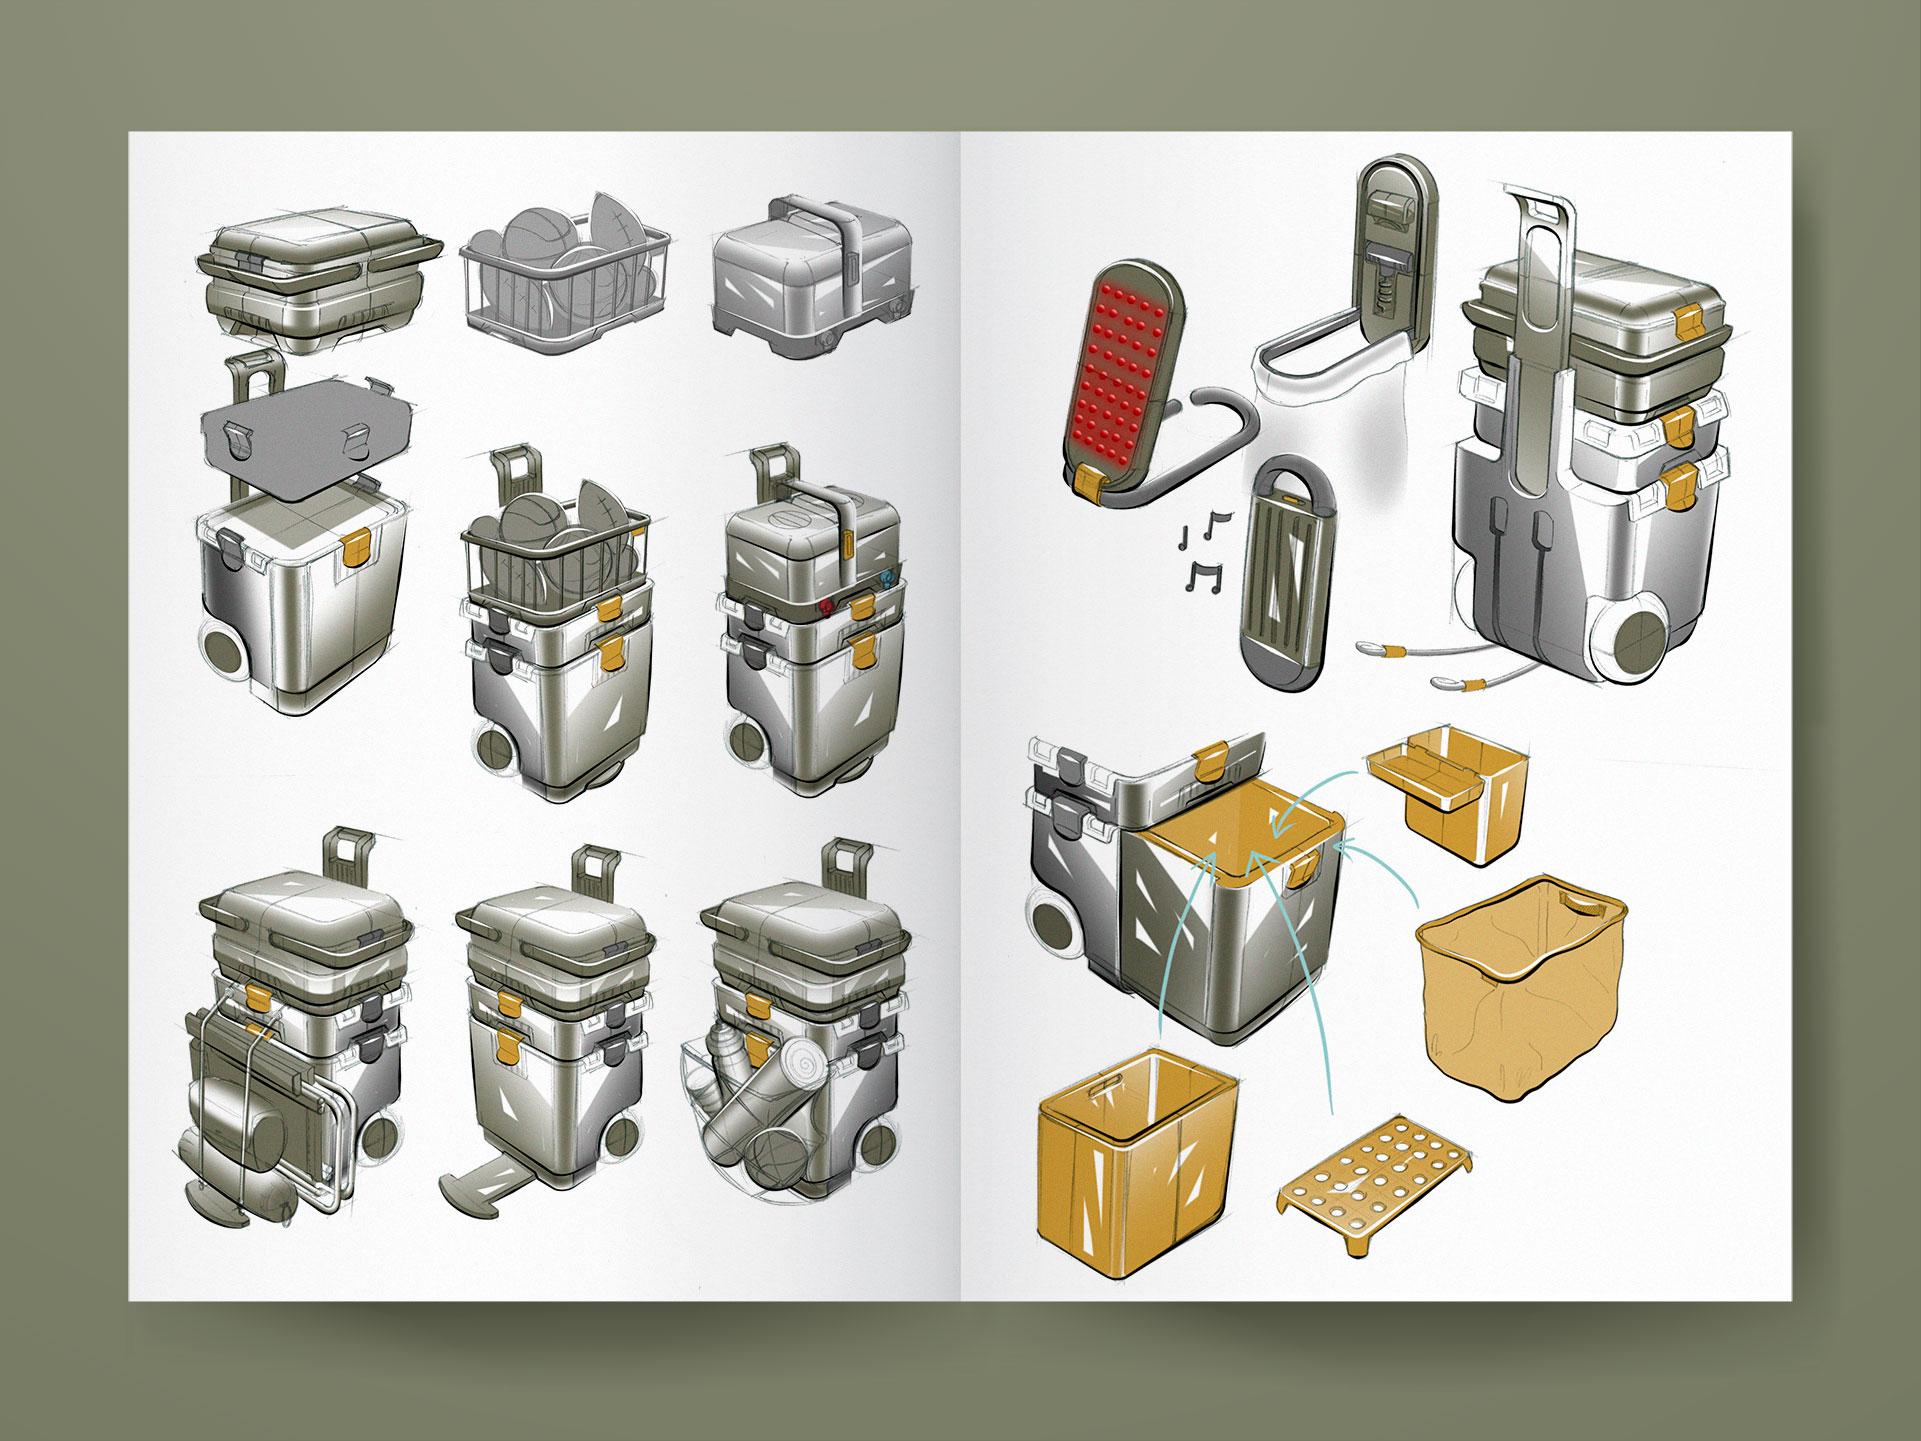 Peli-nomad-cooler-concept-sketches.jpg